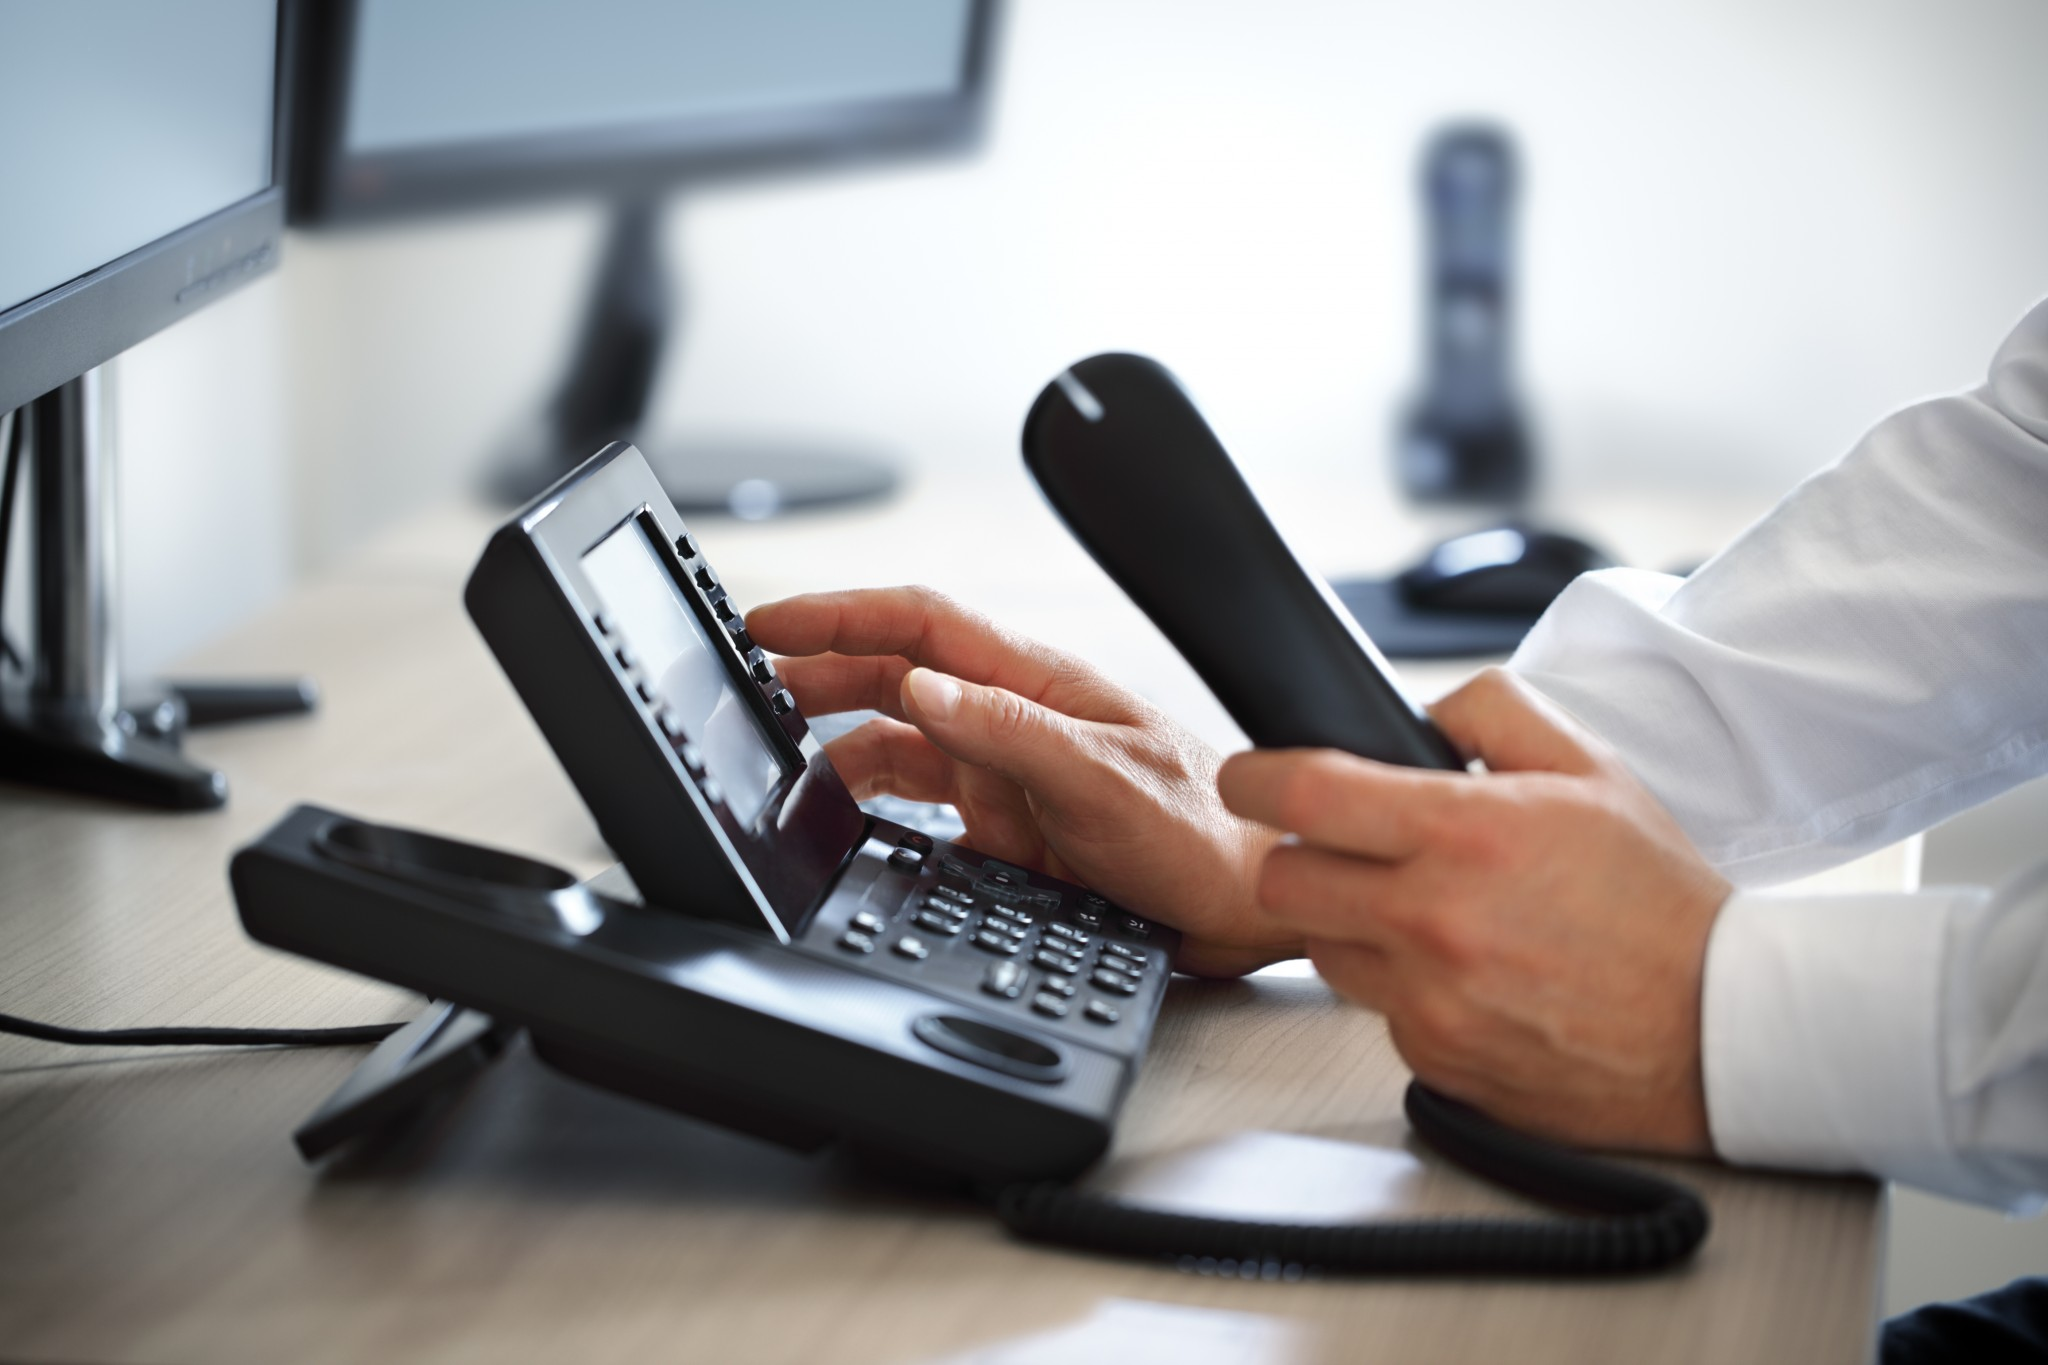 bigstock-Dialing-telephone-keypad-conce-86579804